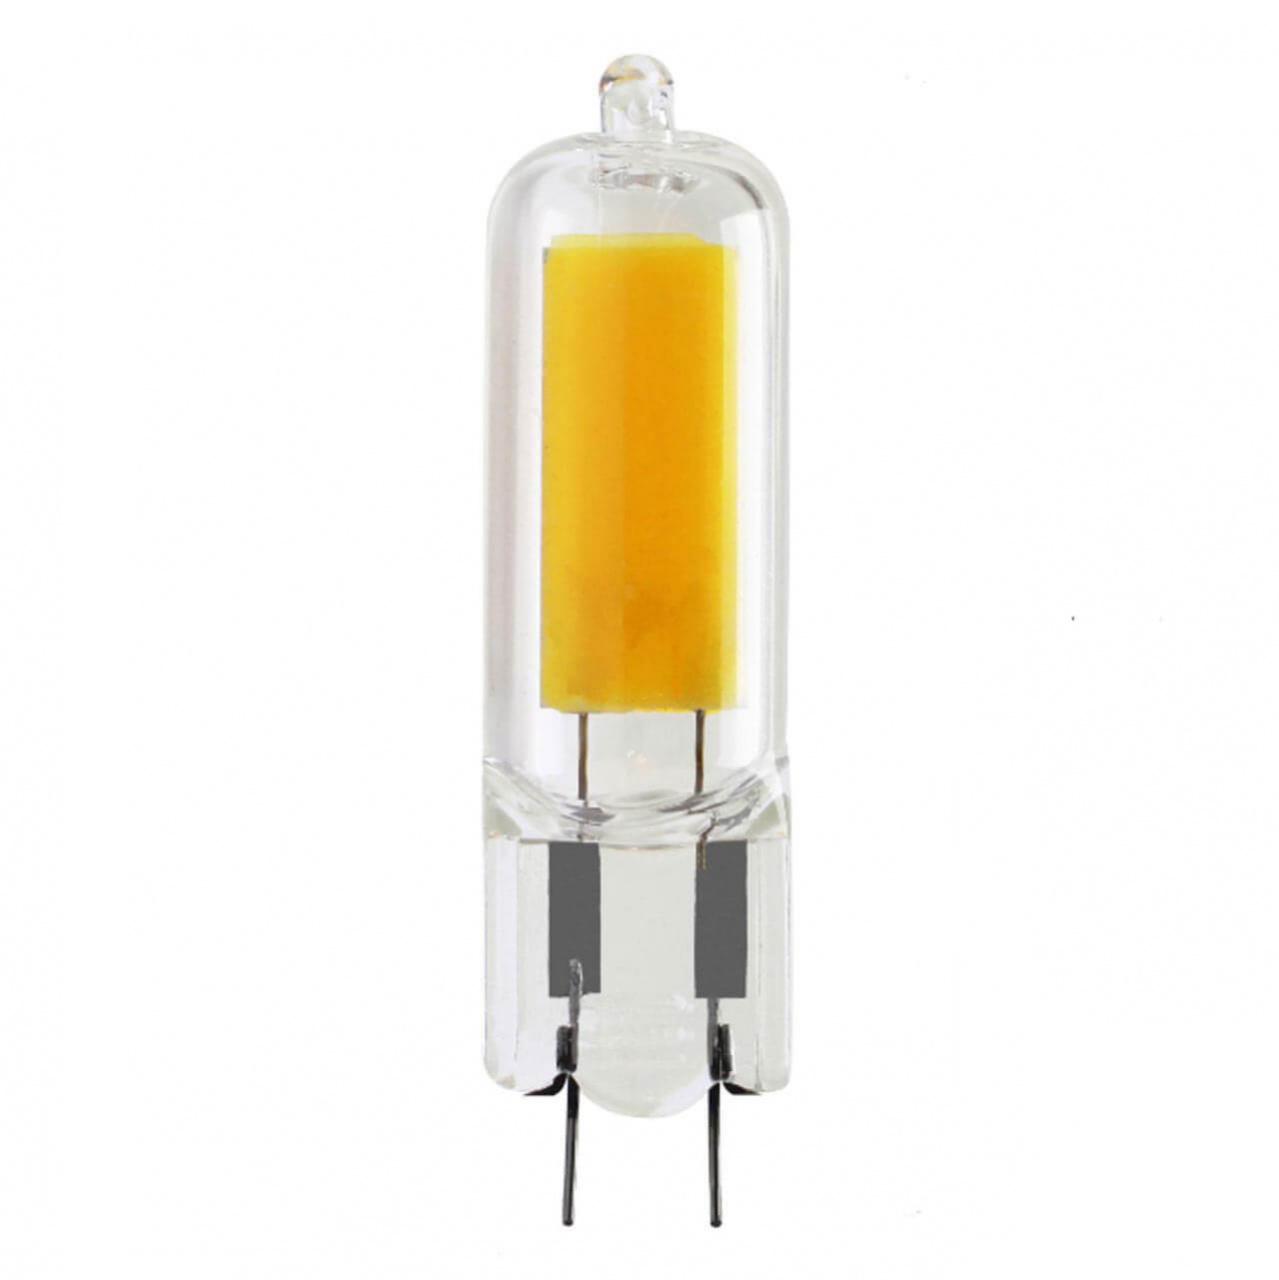 Лампочка Voltega 7093 Capsule voltega лампа светодиодная voltega рефлектор матовый e14 5 4w 4000к vg4 rm2e14cold5w 5756